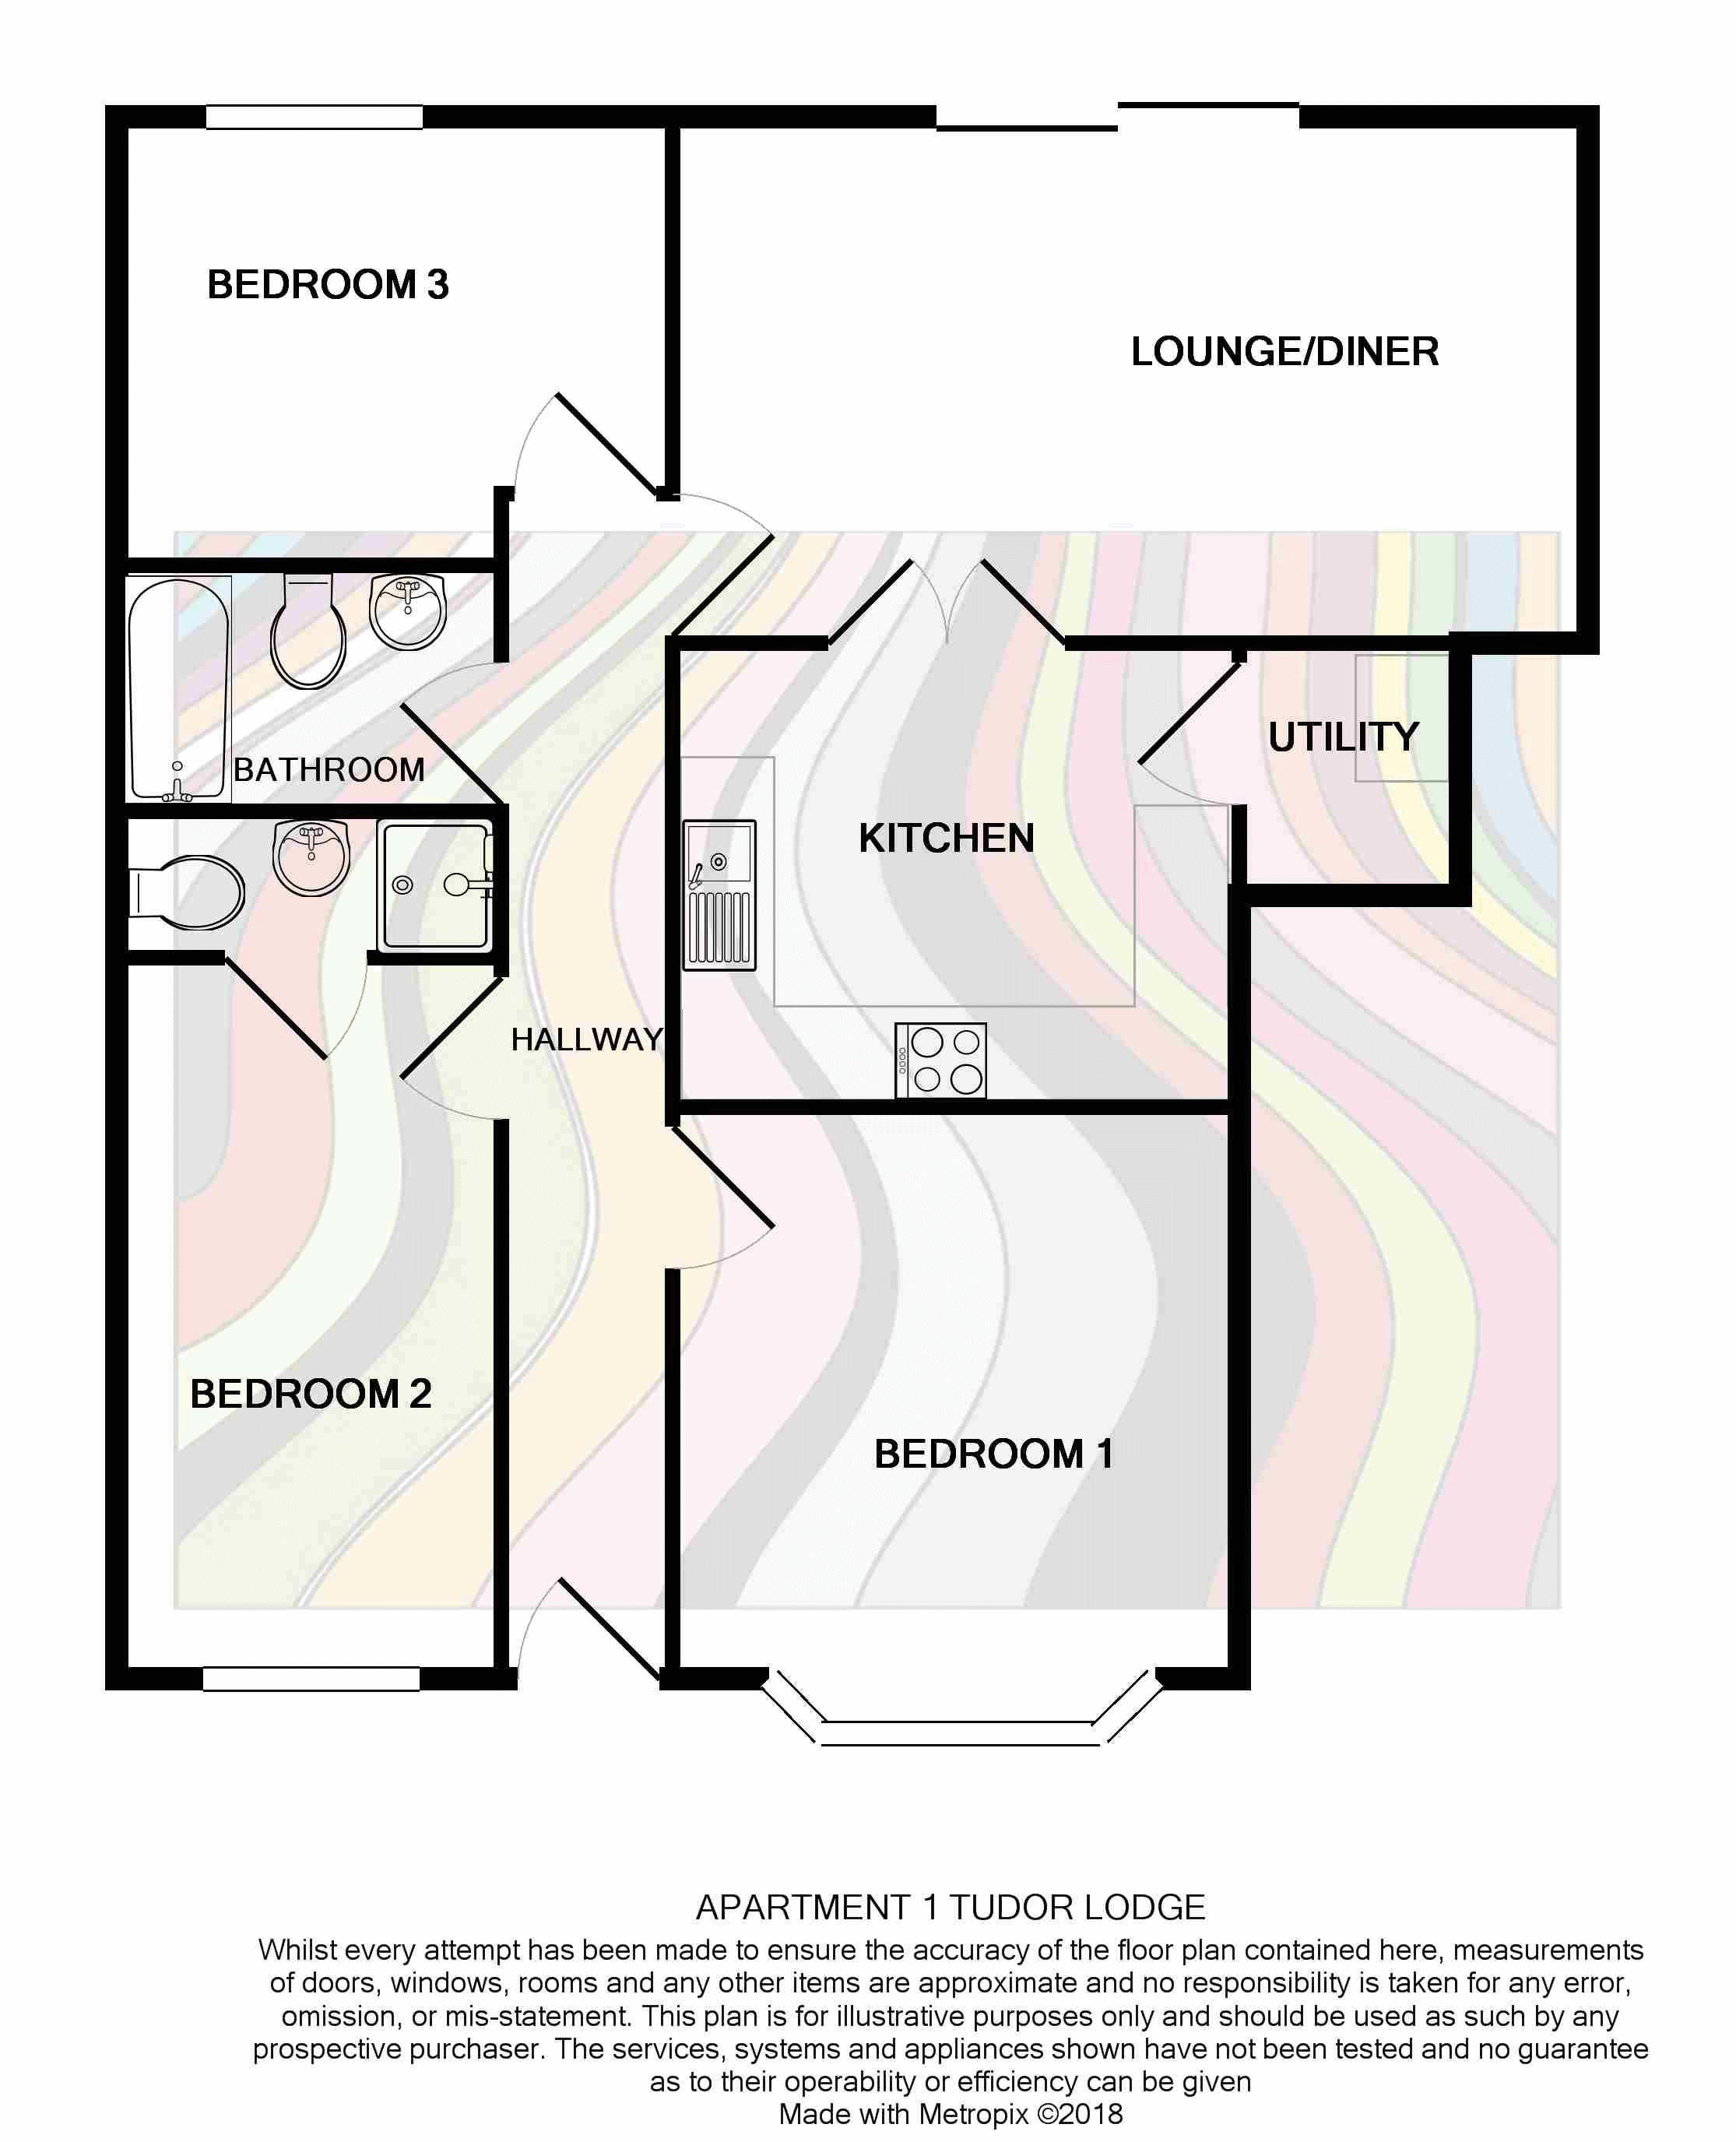 Apartment 1 Tudor Lodge